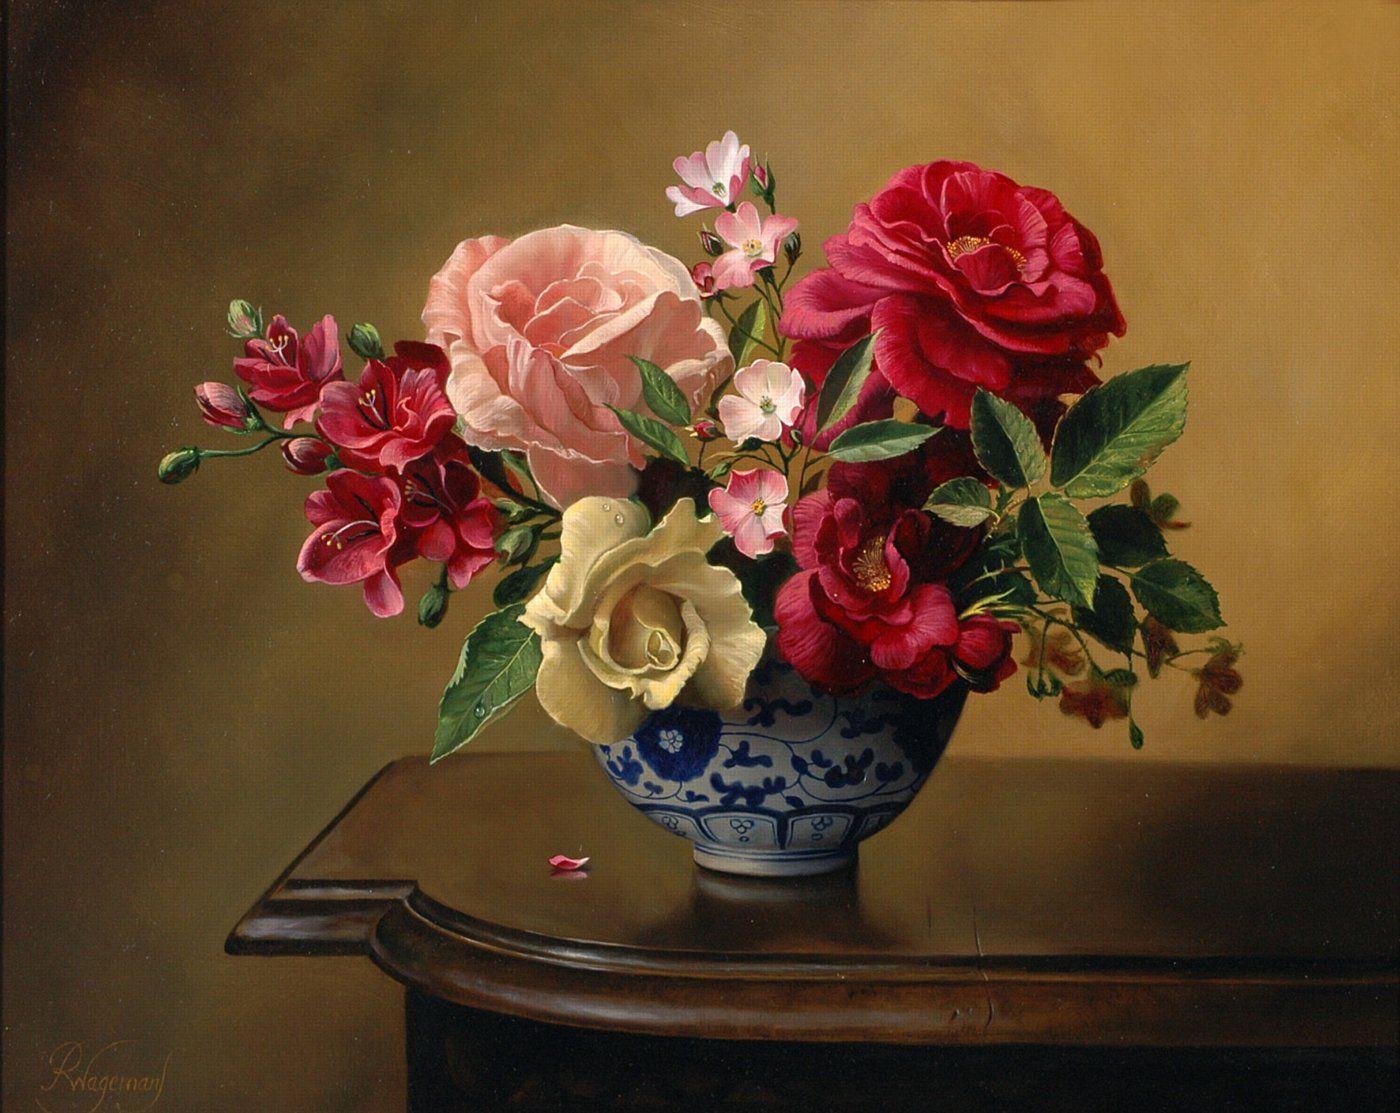 Натюрморт с цветами и вазой